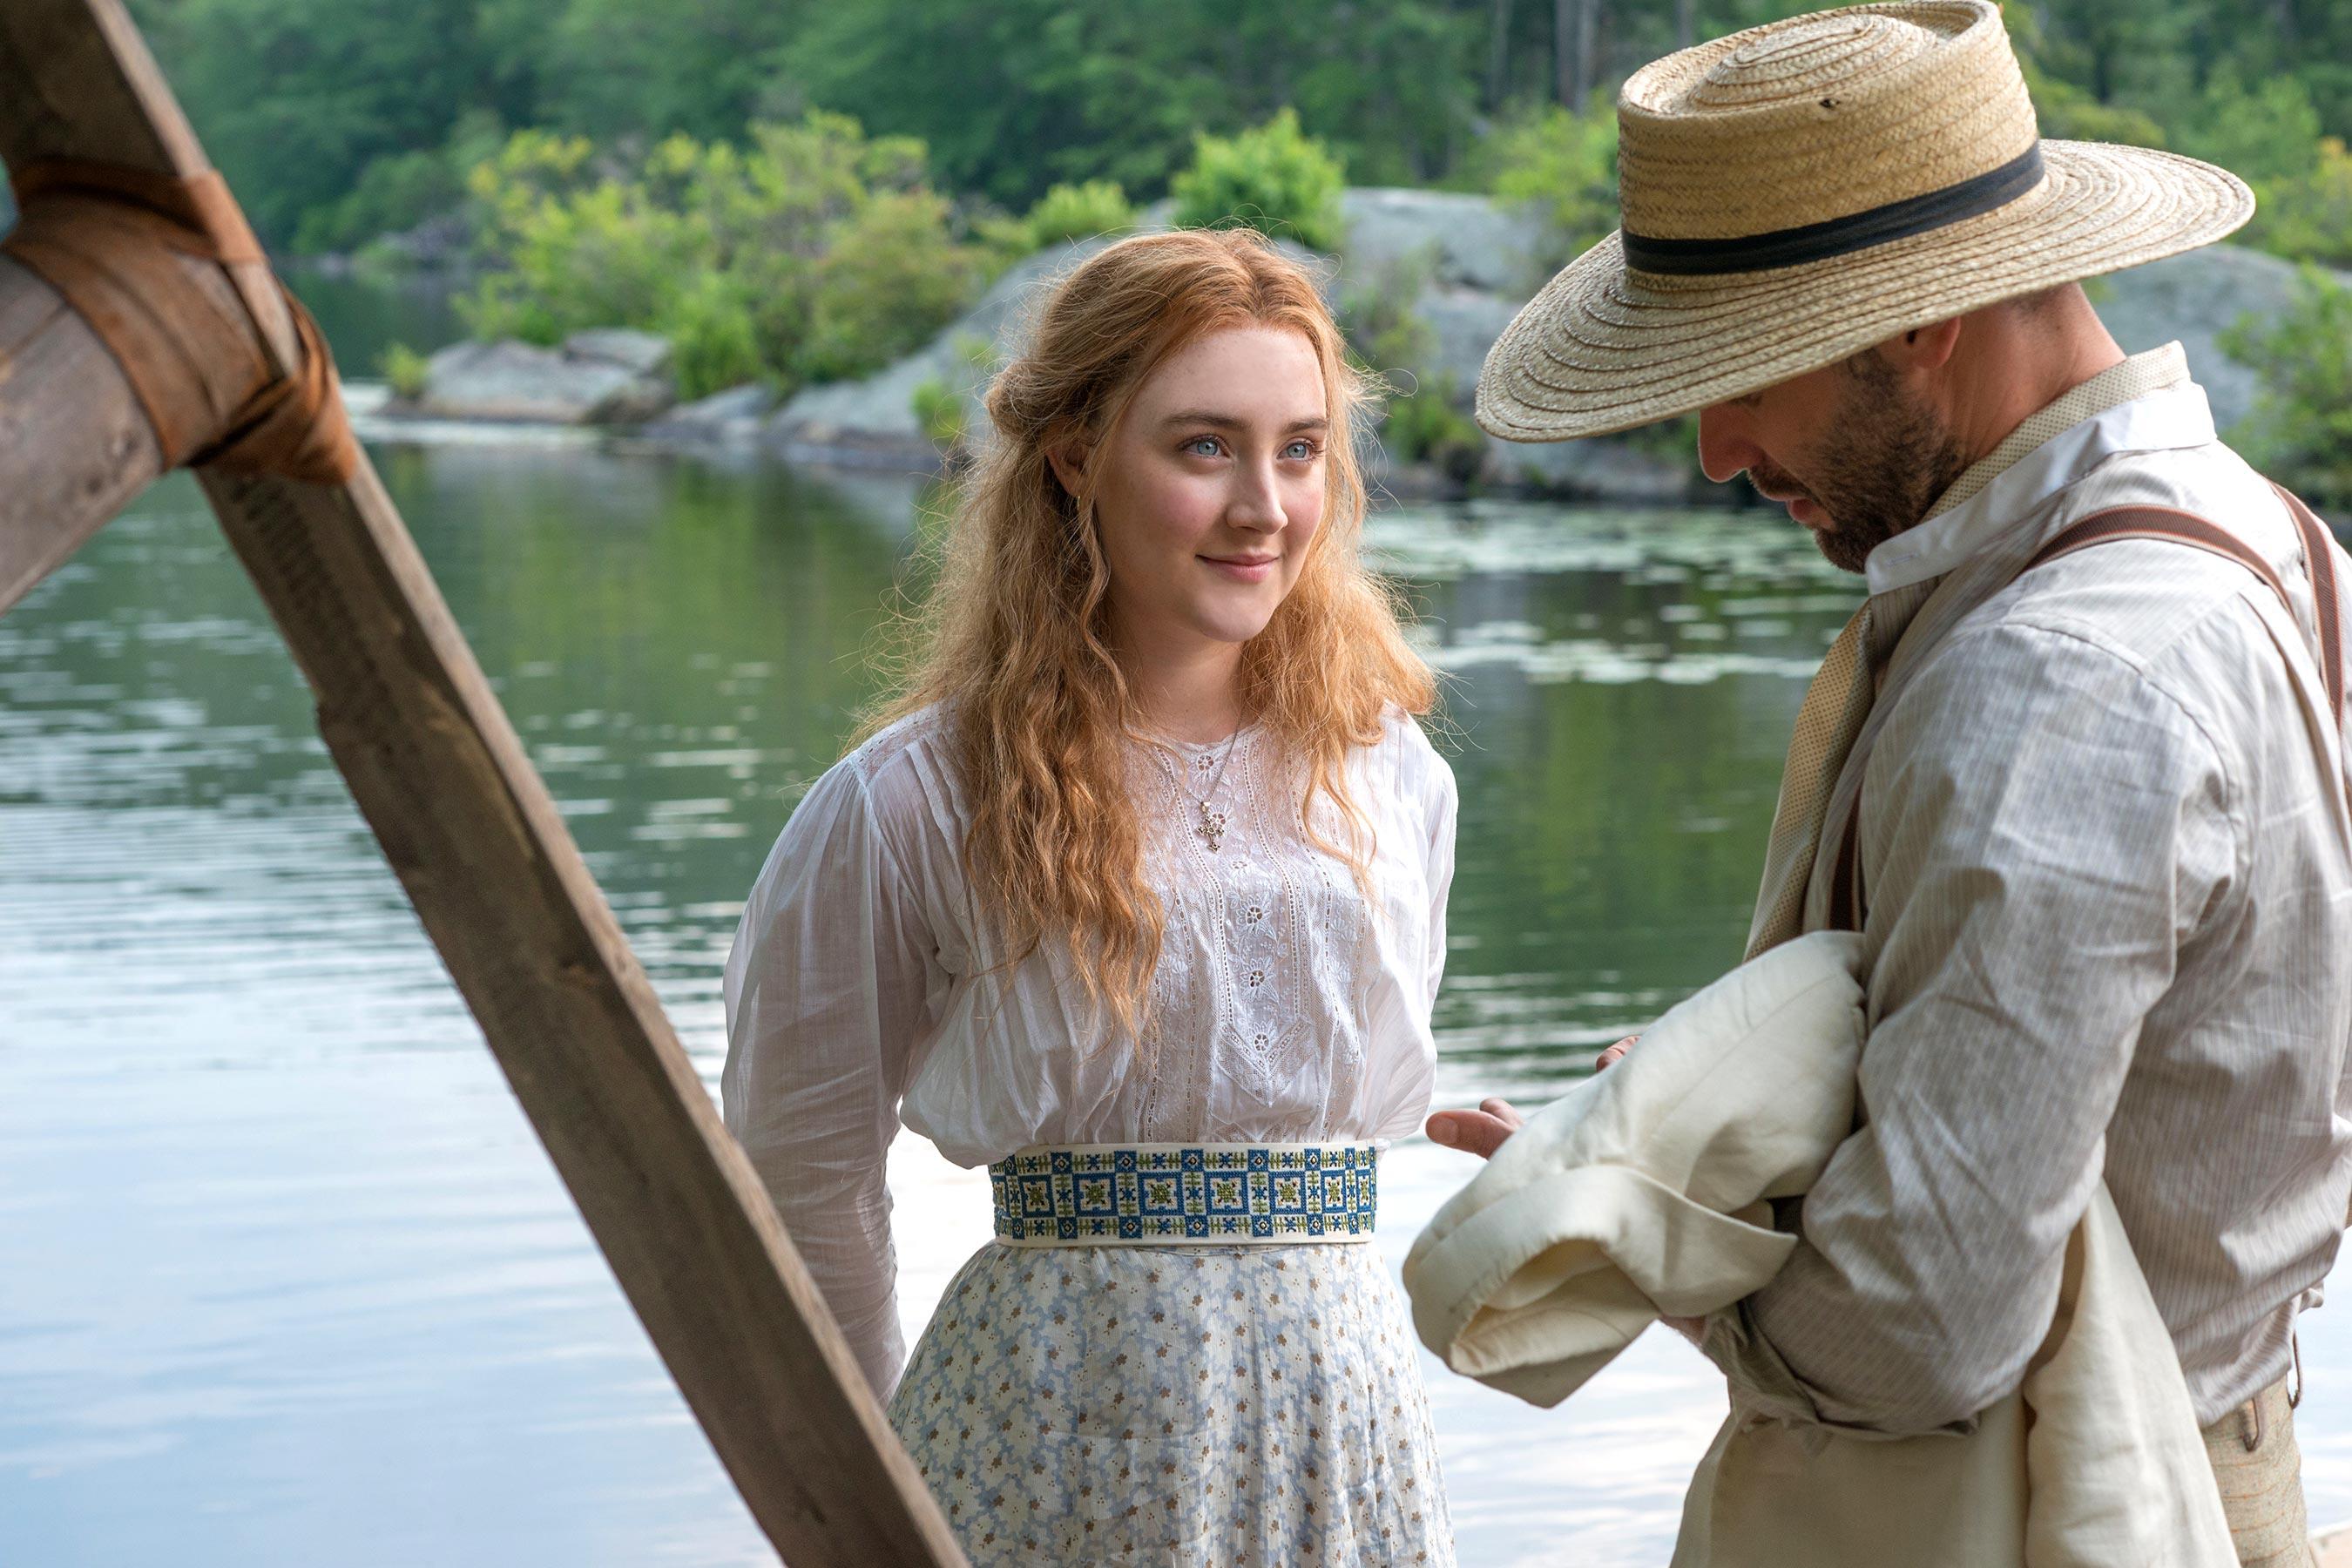 Saoirse Ronan in The Seagull